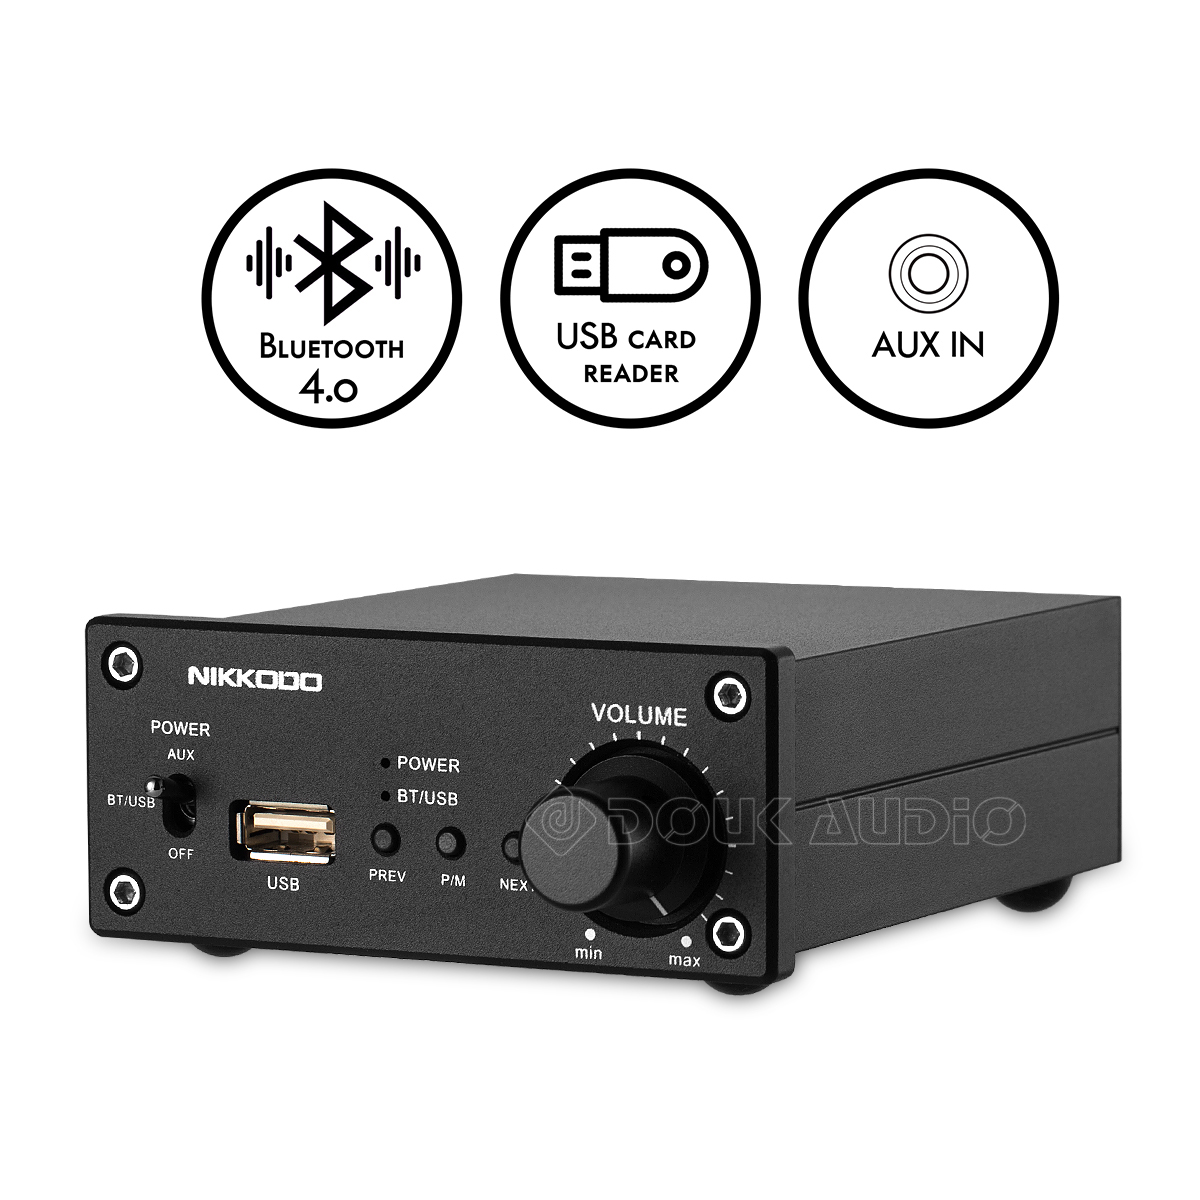 0cc25aabb4423b Details about Mini Digital Power Amplifier Bluetooth Stereo Amp HiFi USB  Lossless Music Player